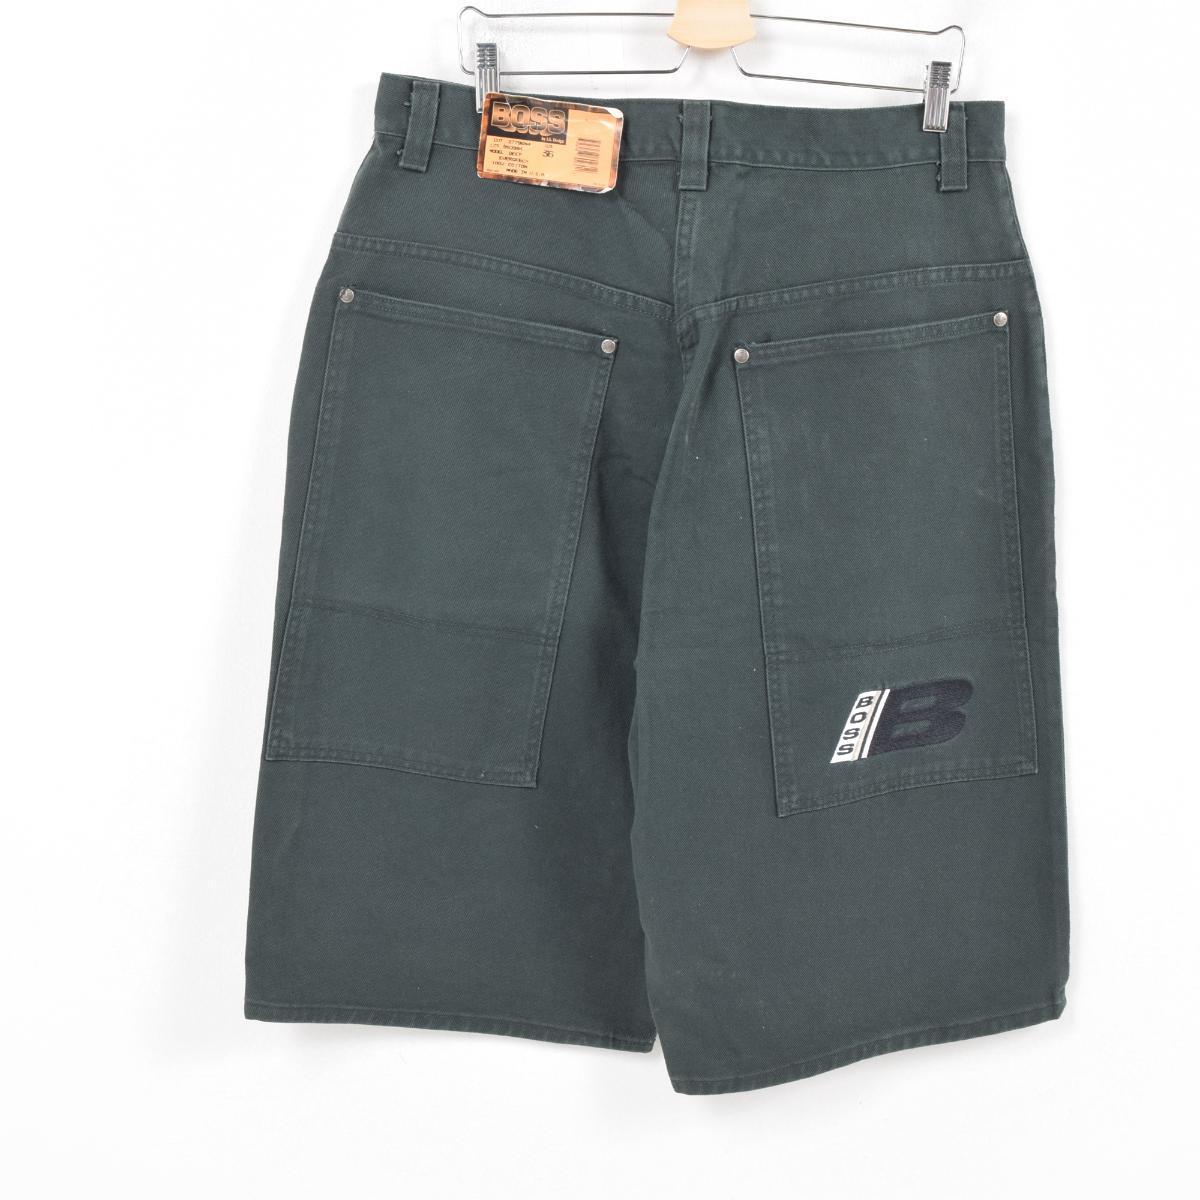 3be6a09f Men w37 /war9811 made in dead stock DEADSTOCK boss BOSS color denim shorts  short pants USA